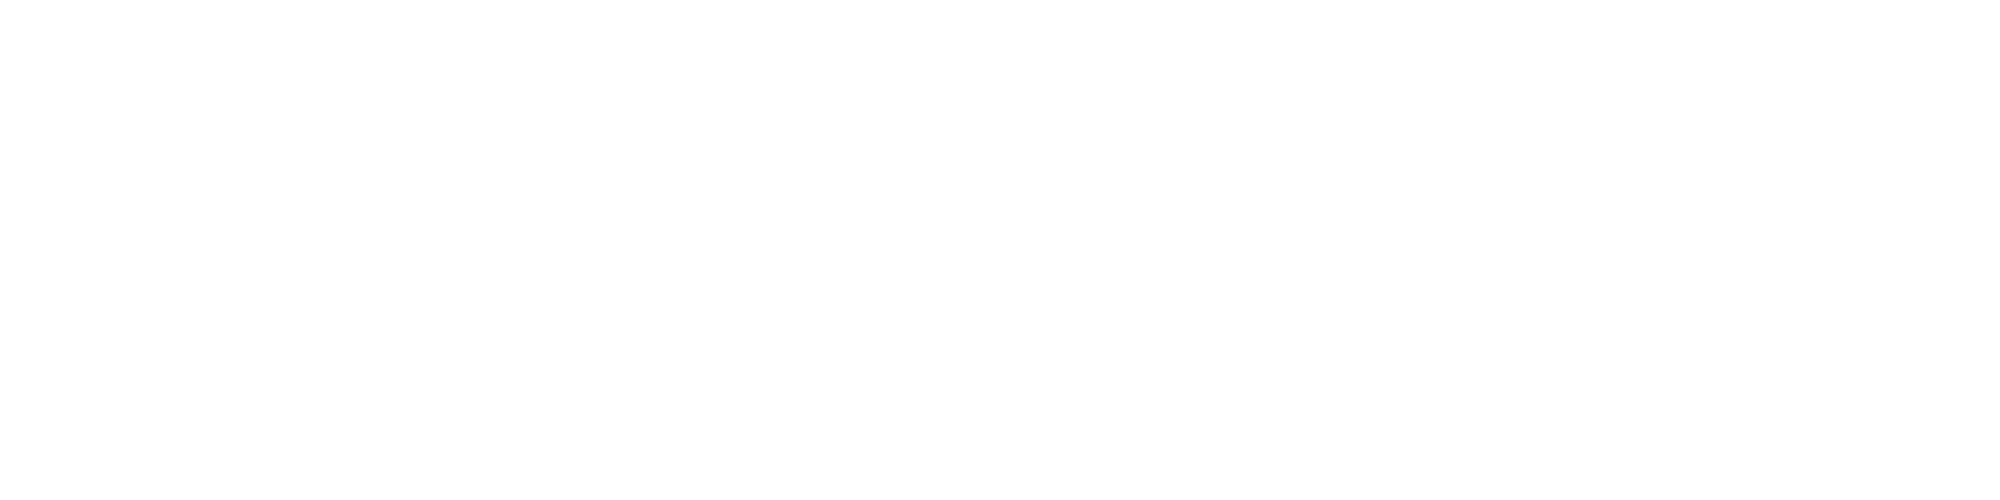 Ruben Martín